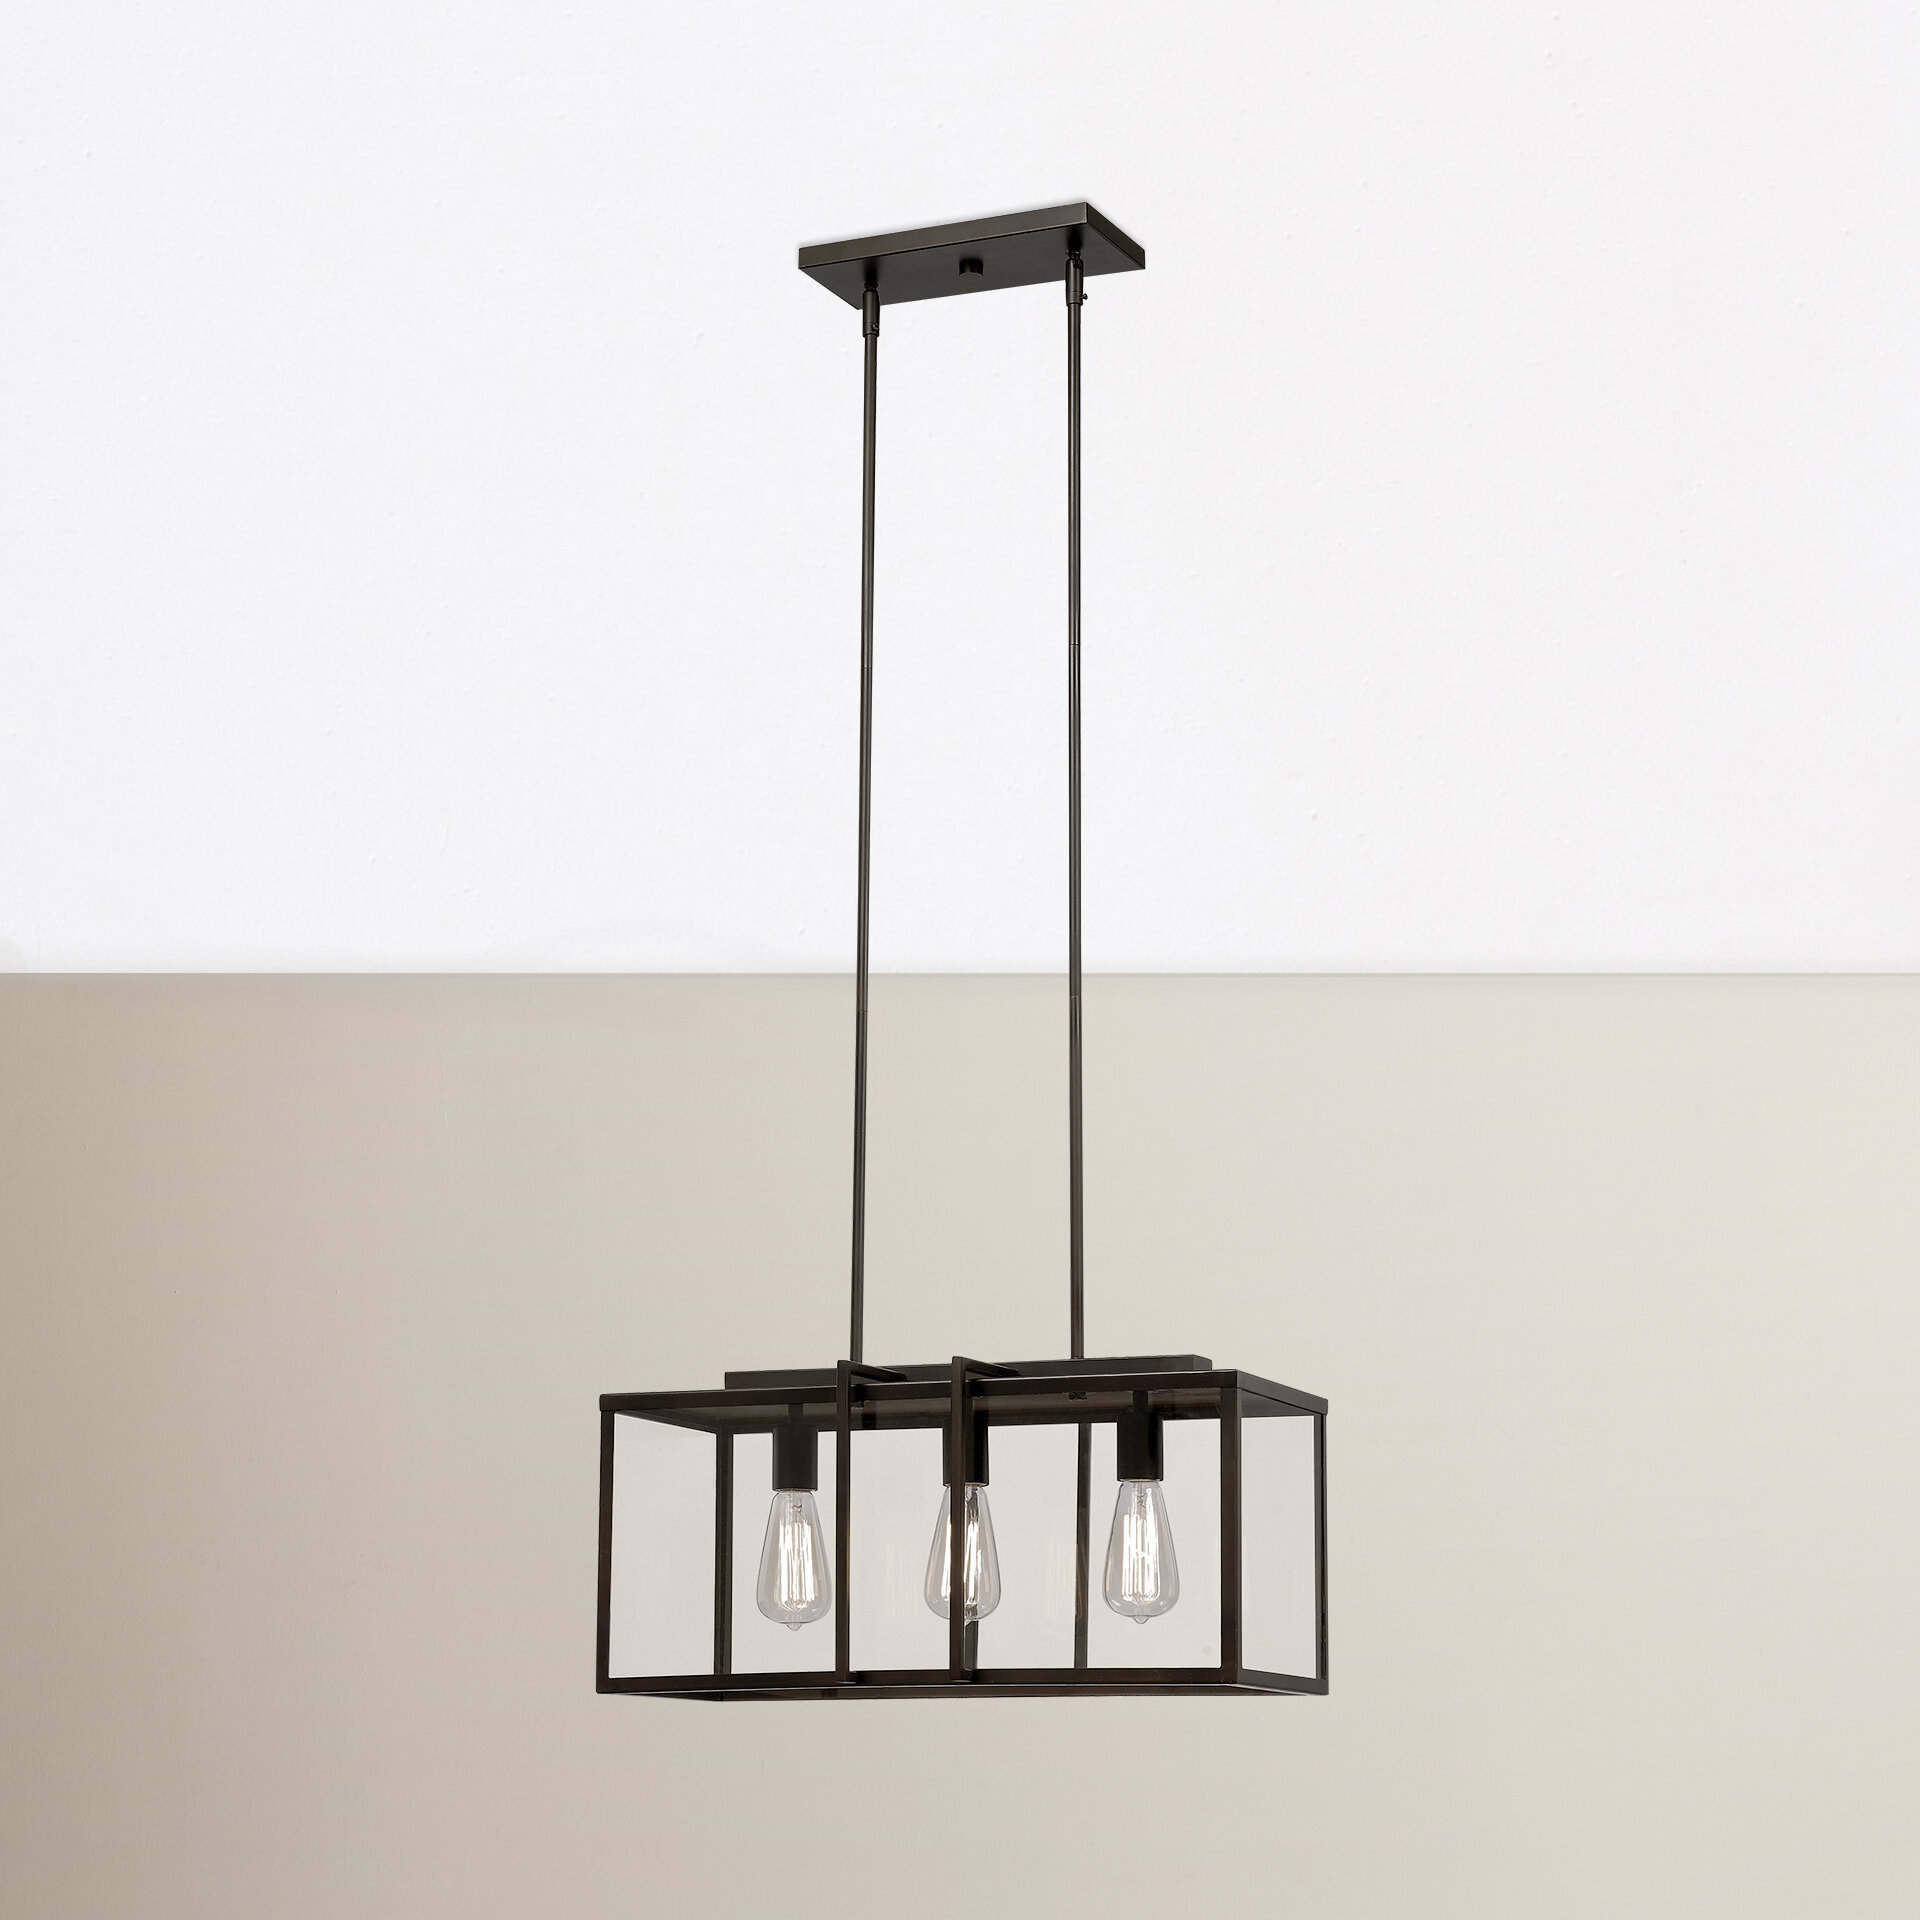 3 light pendant light industrial trent austin design 3light kitchen island pendant reviews wayfair